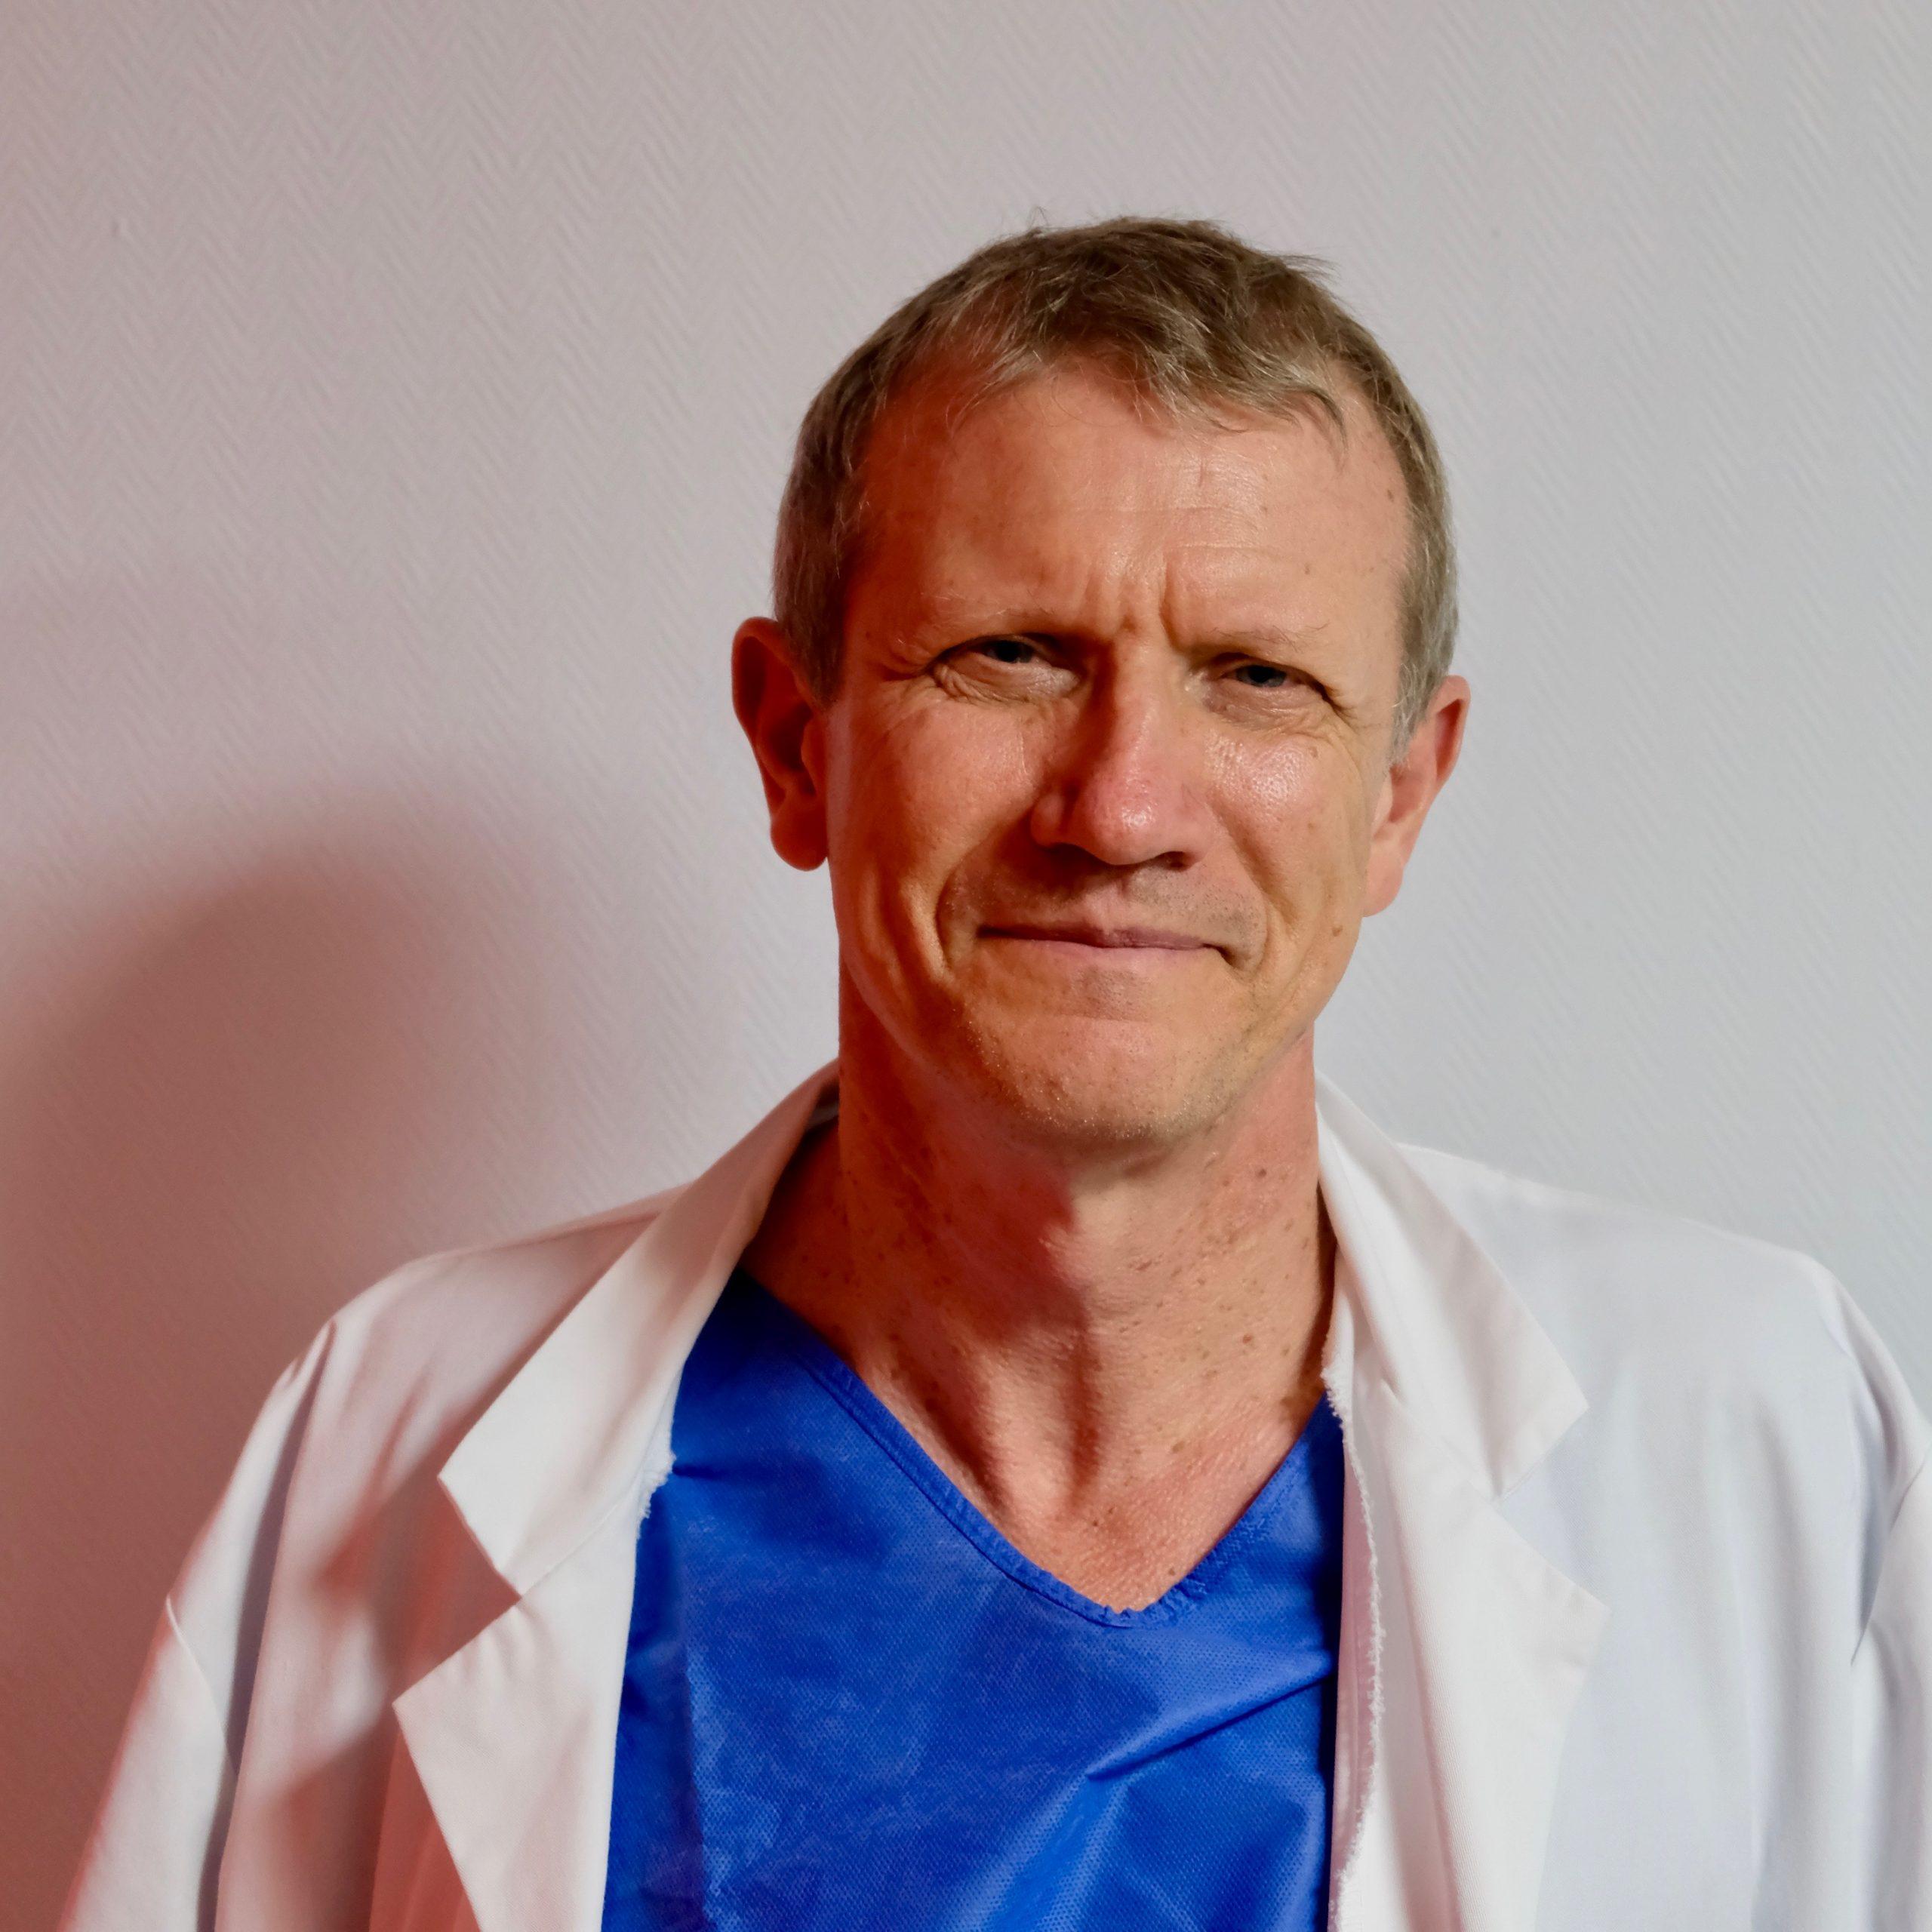 Dr GUETTIER